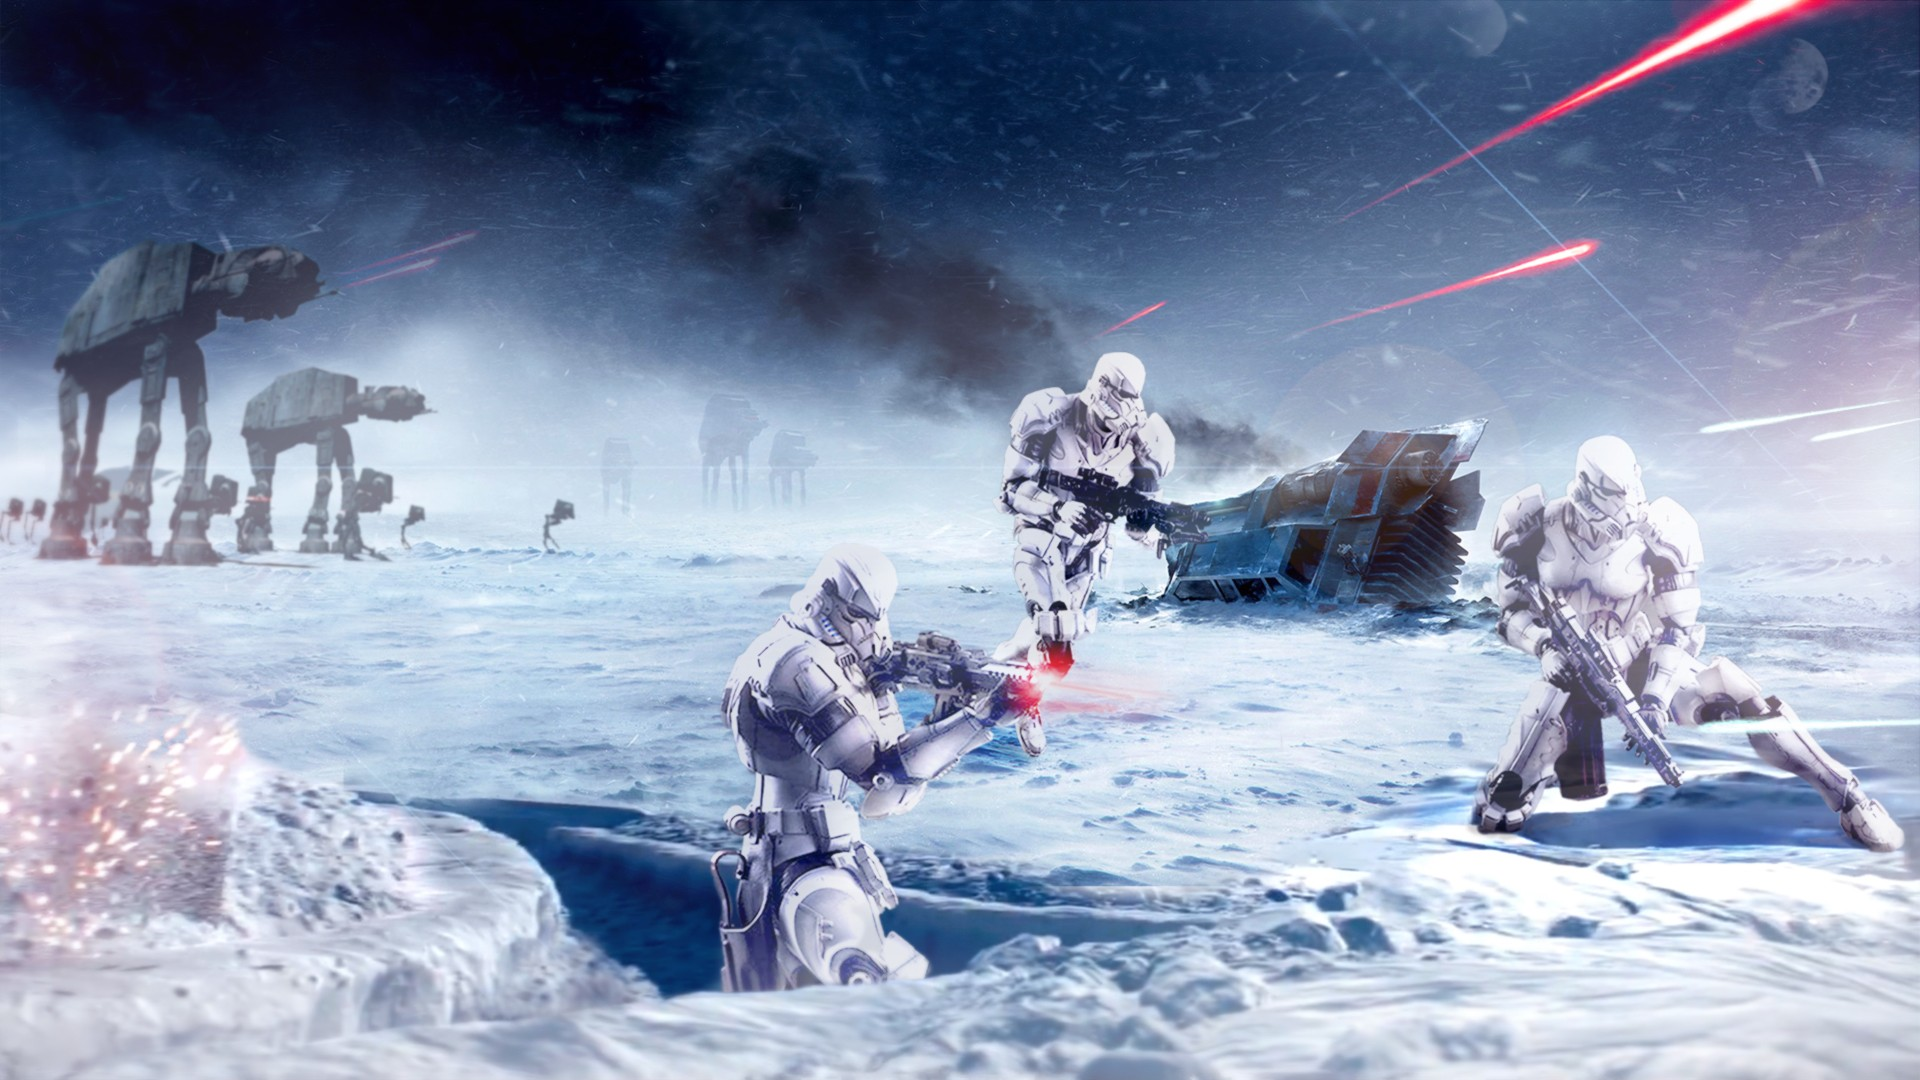 49 Star Wars Galactic Empire Wallpaper On Wallpapersafari